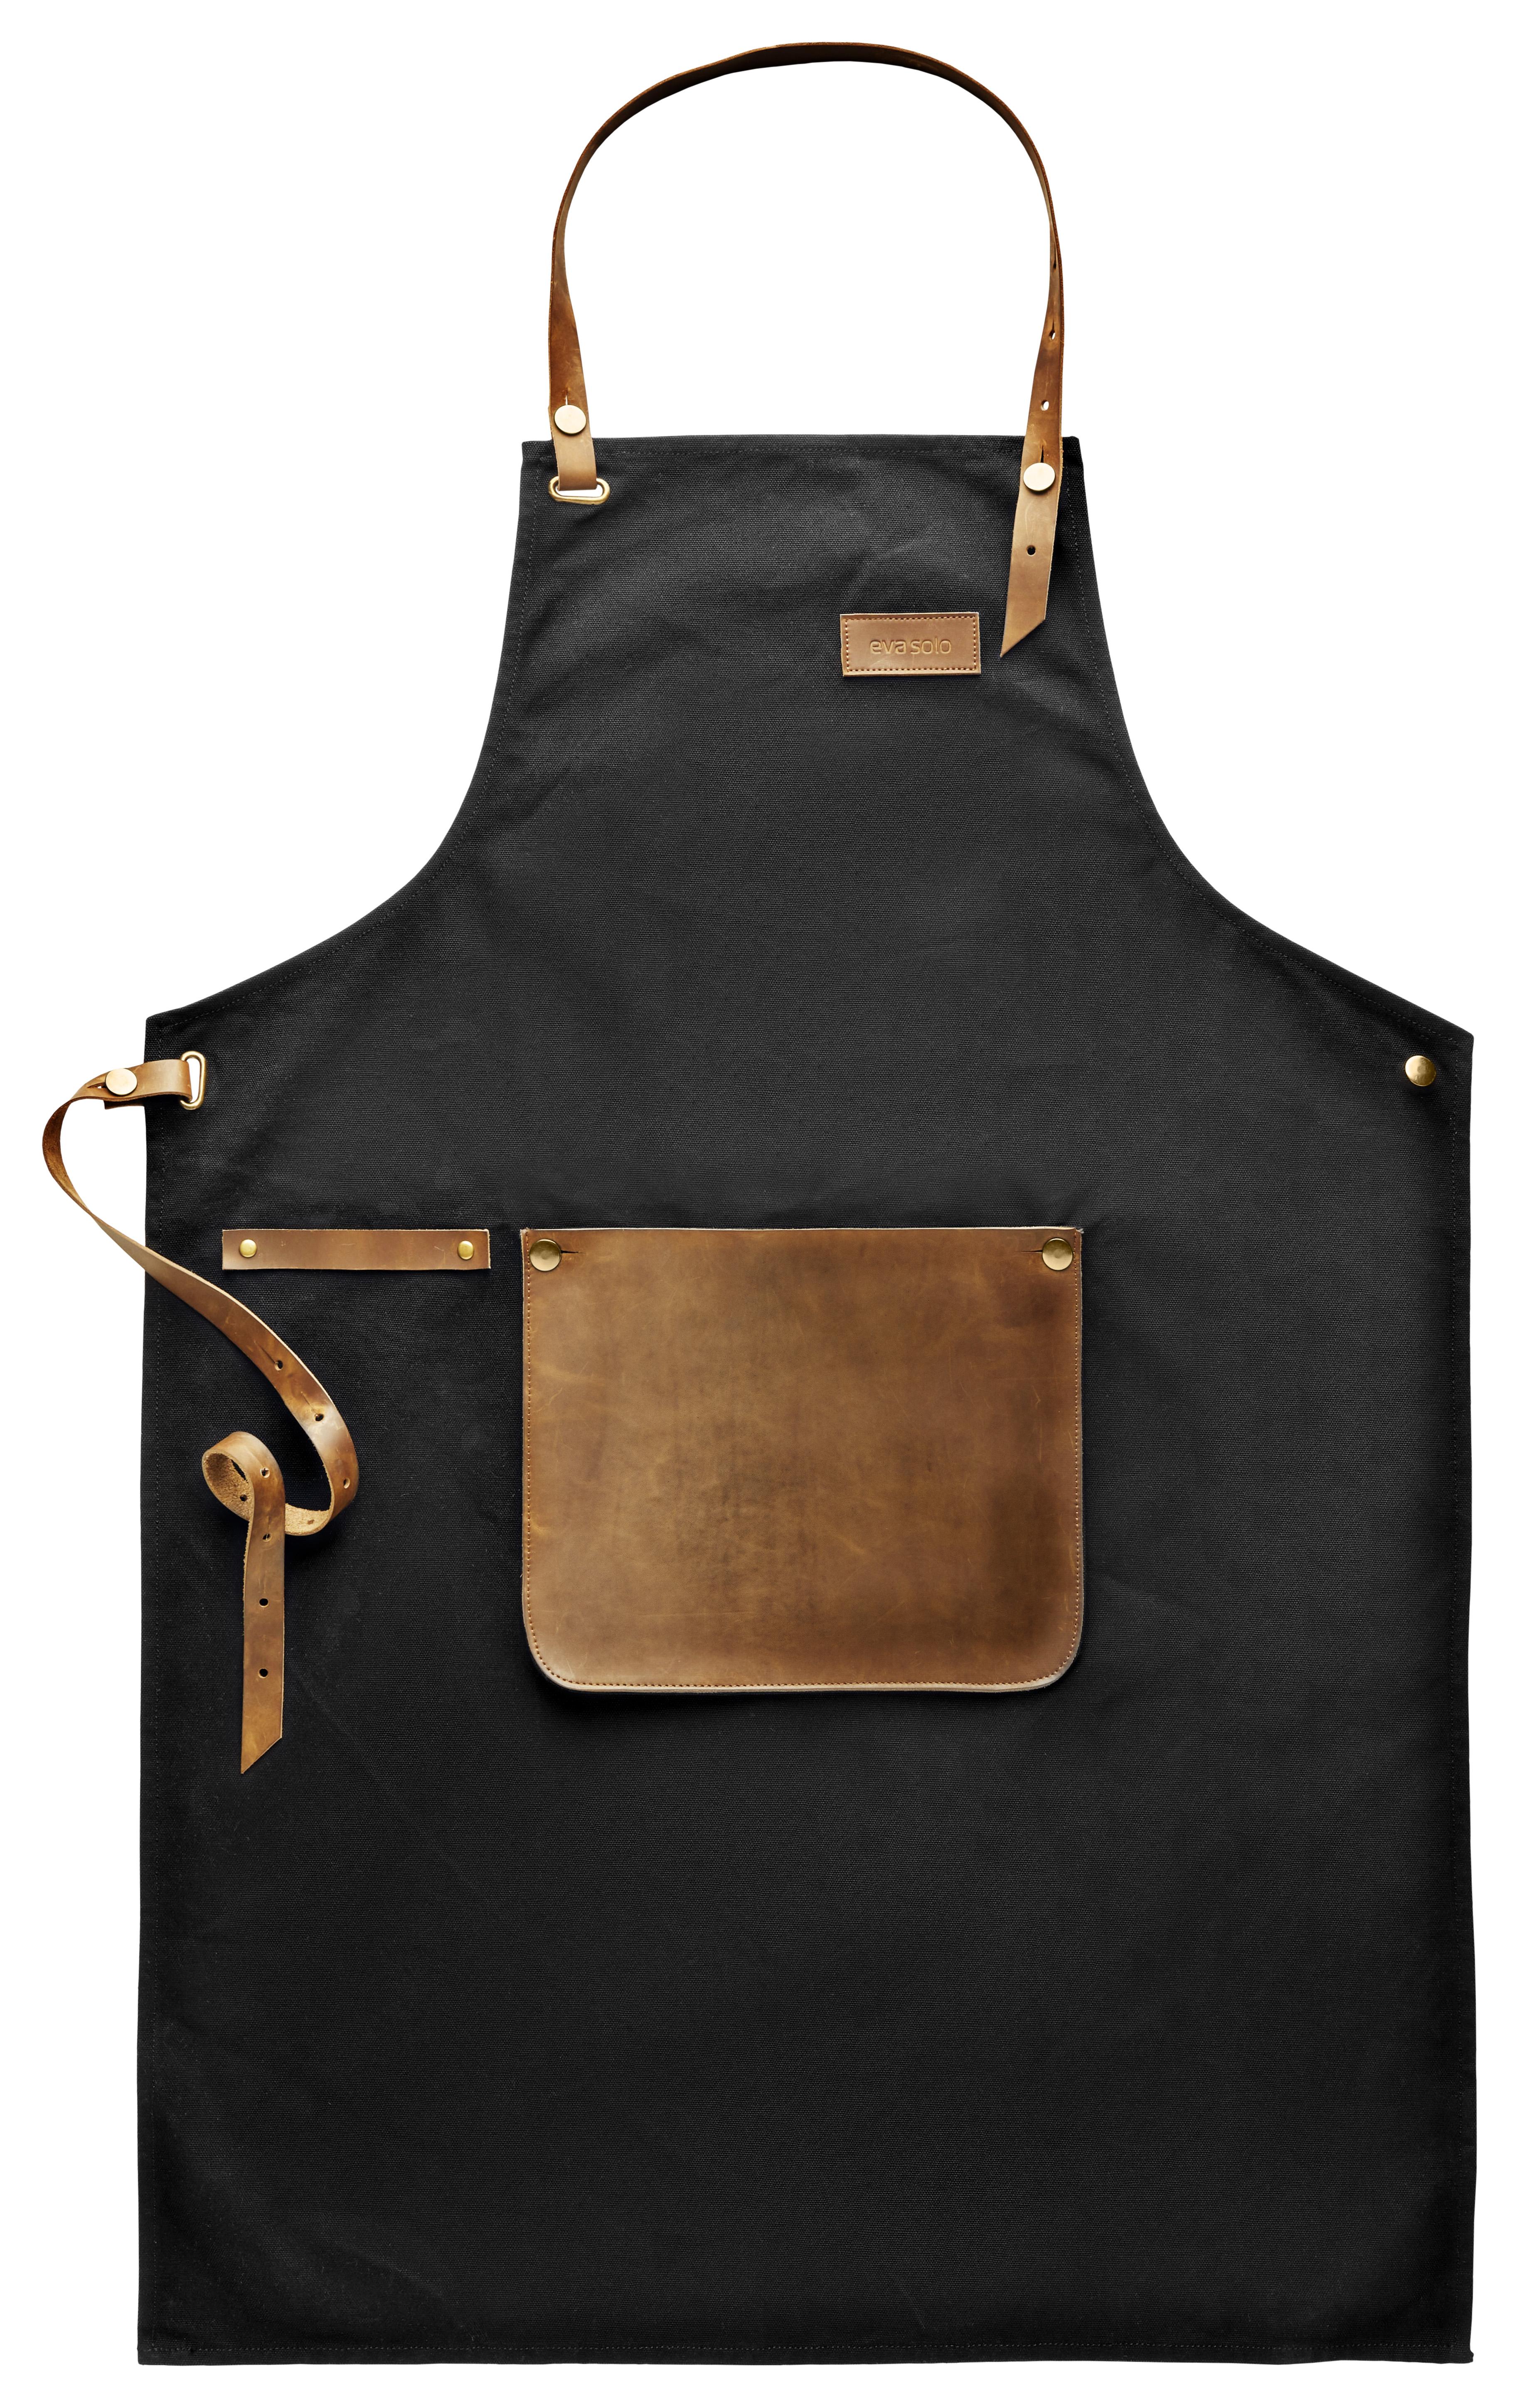 Eva Solo - Aprons Canvas Leather - Black (571113)